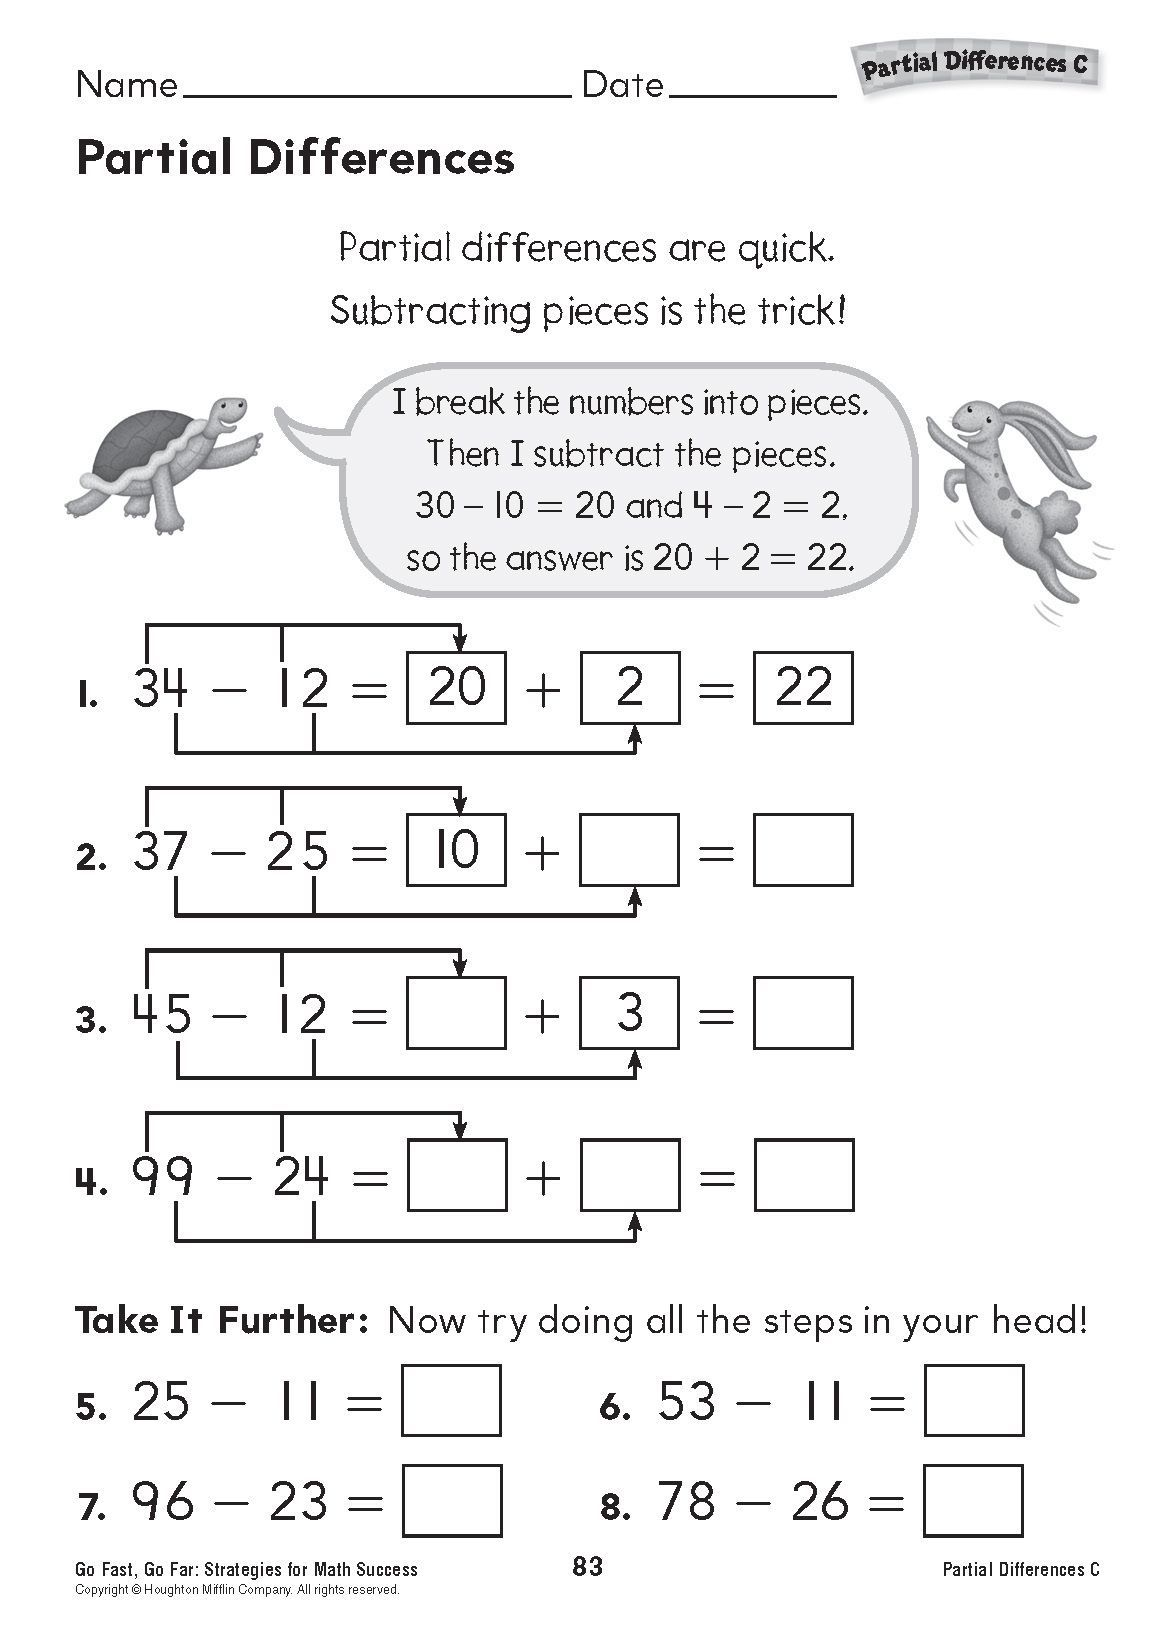 5 Rounding Worksheets 3rd Grade Learning F03edefcd4e4411cf3c Aa9e5d9 [ 1632 x 1174 Pixel ]